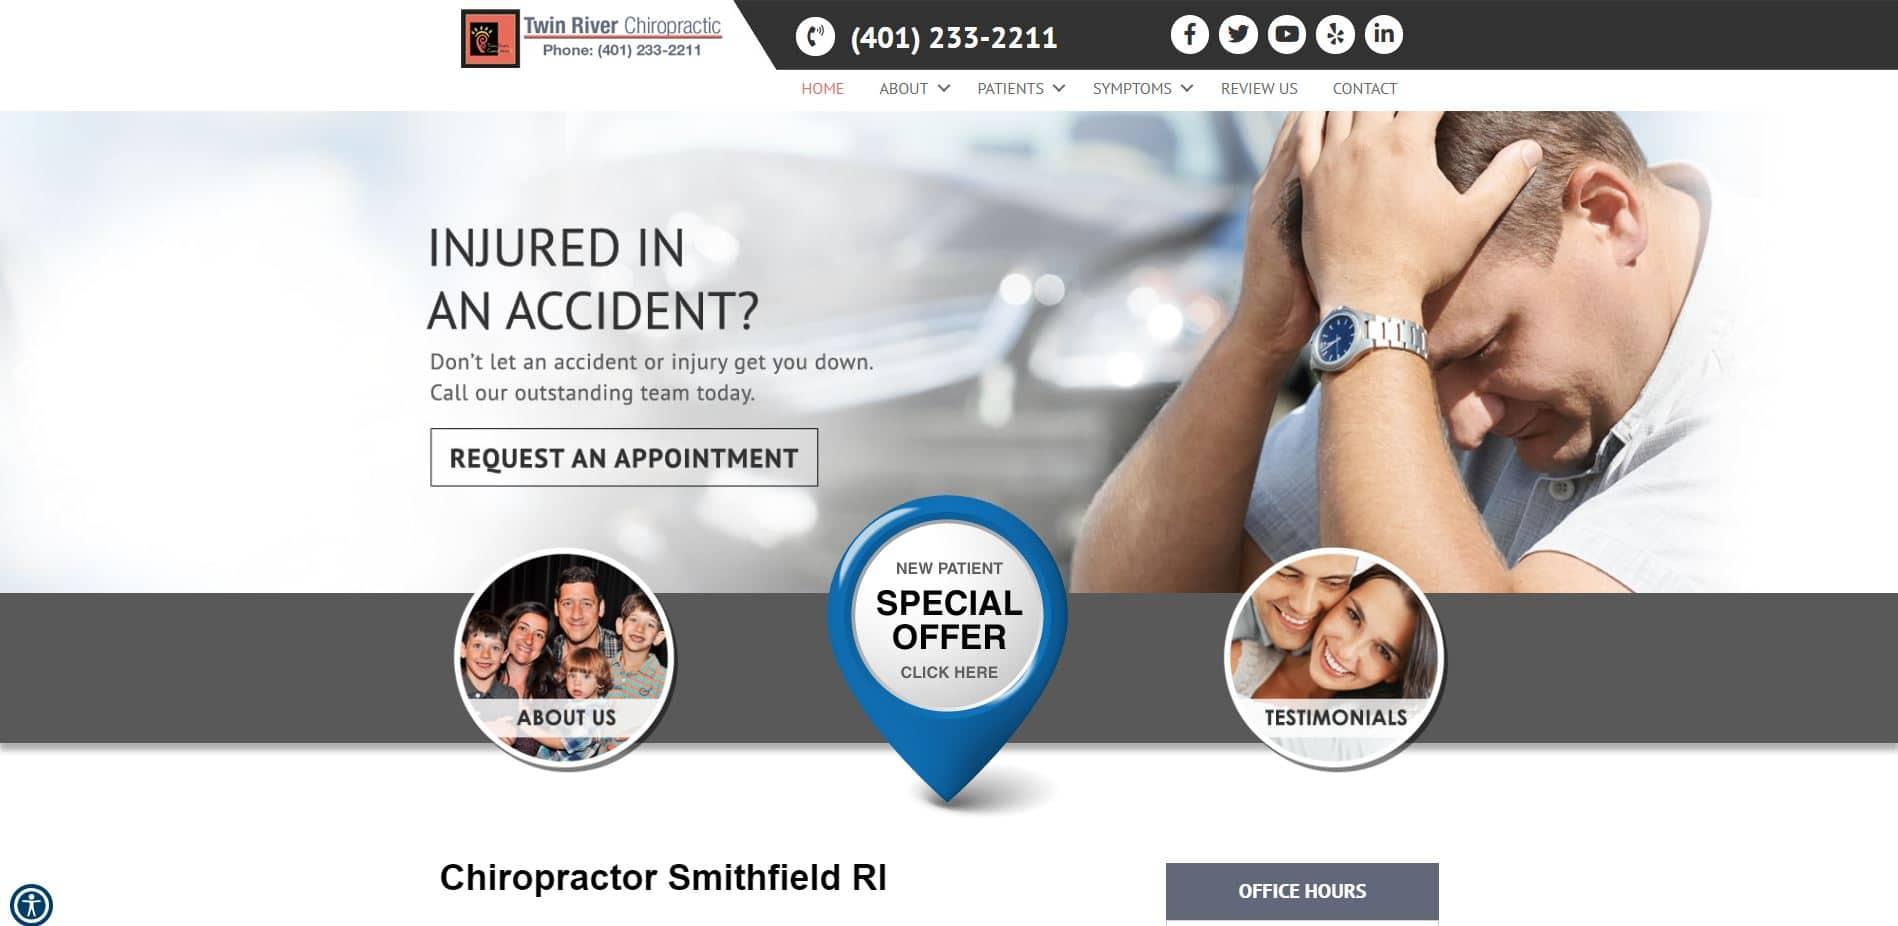 Chiropractor in Smithfield